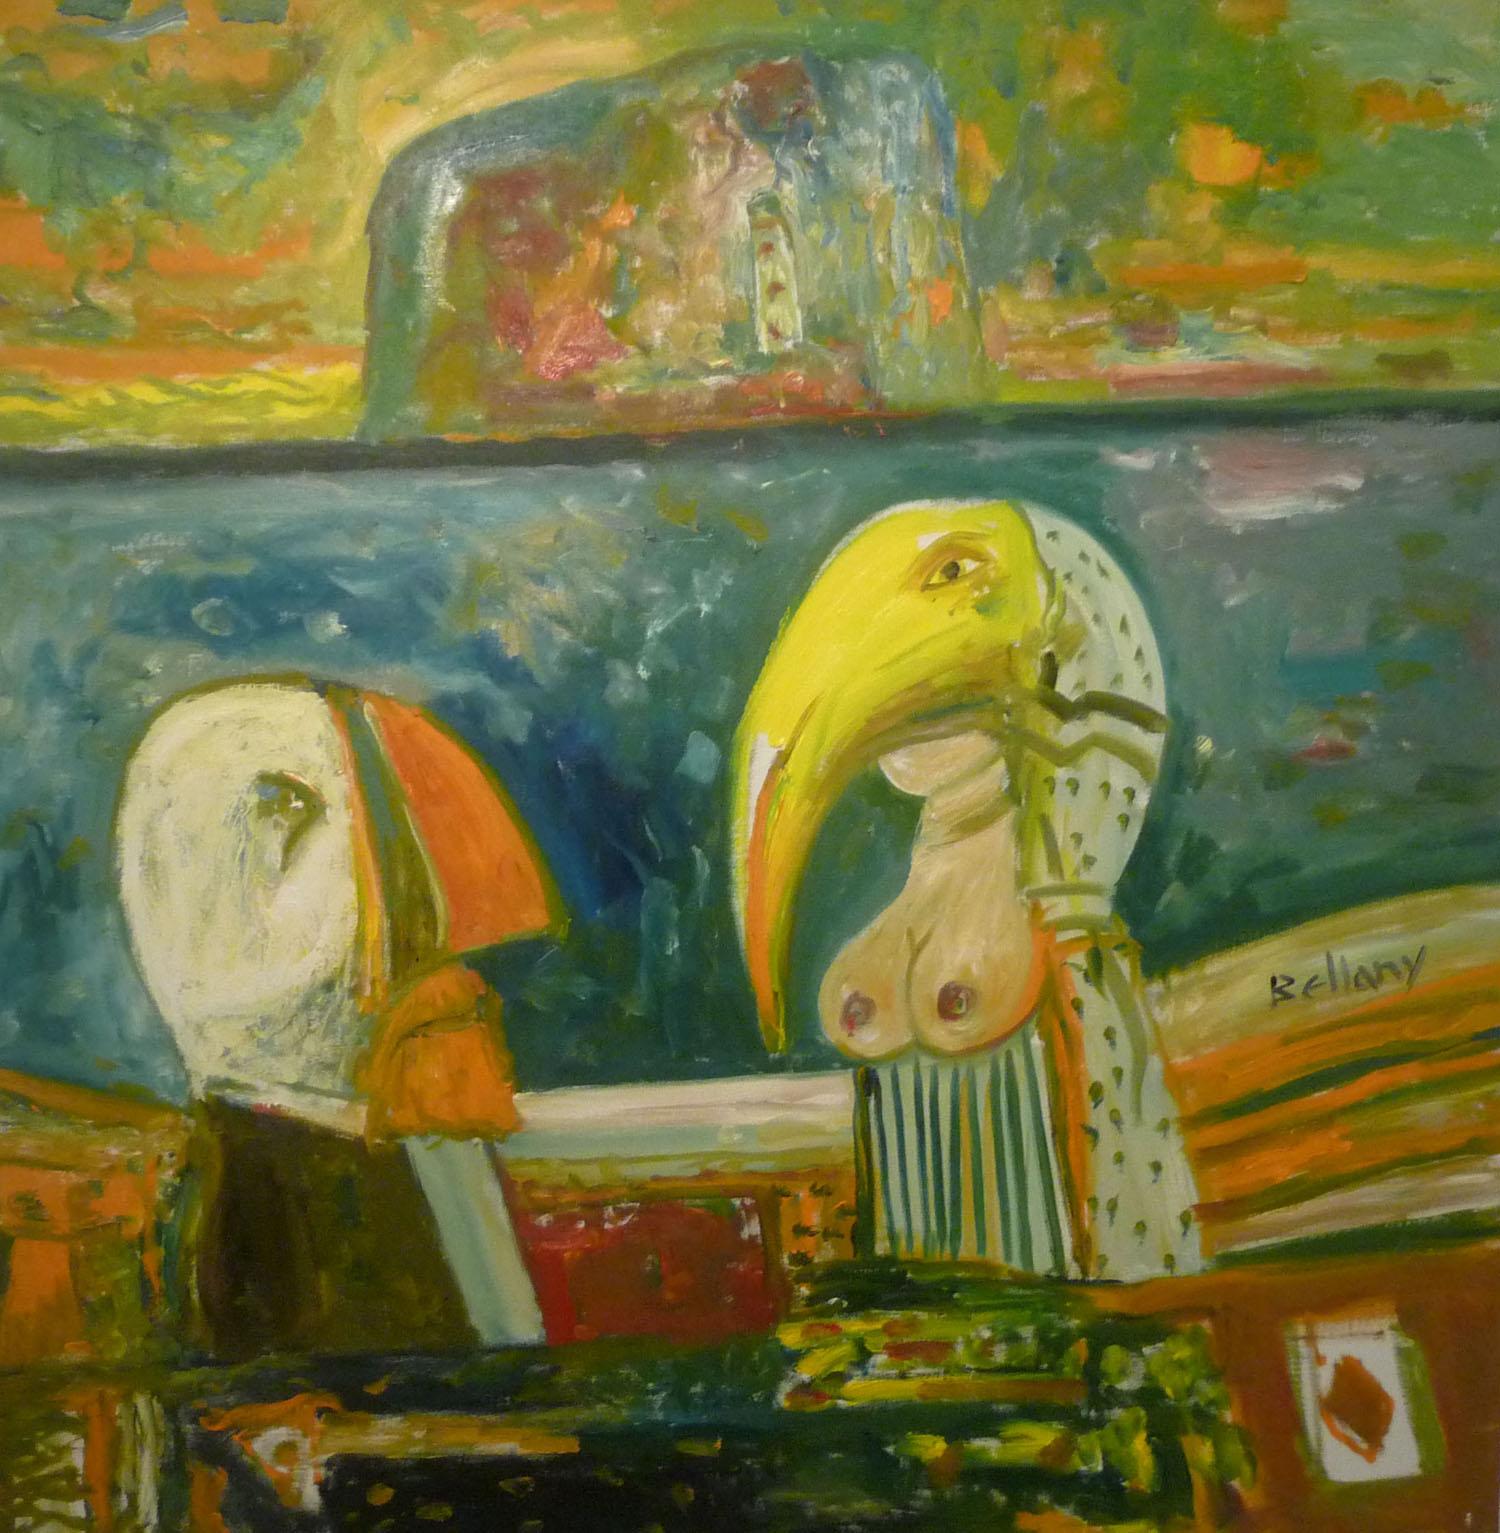 John Bellany 'Puffin Mystery' oil on canvas 122x122cm.jpg